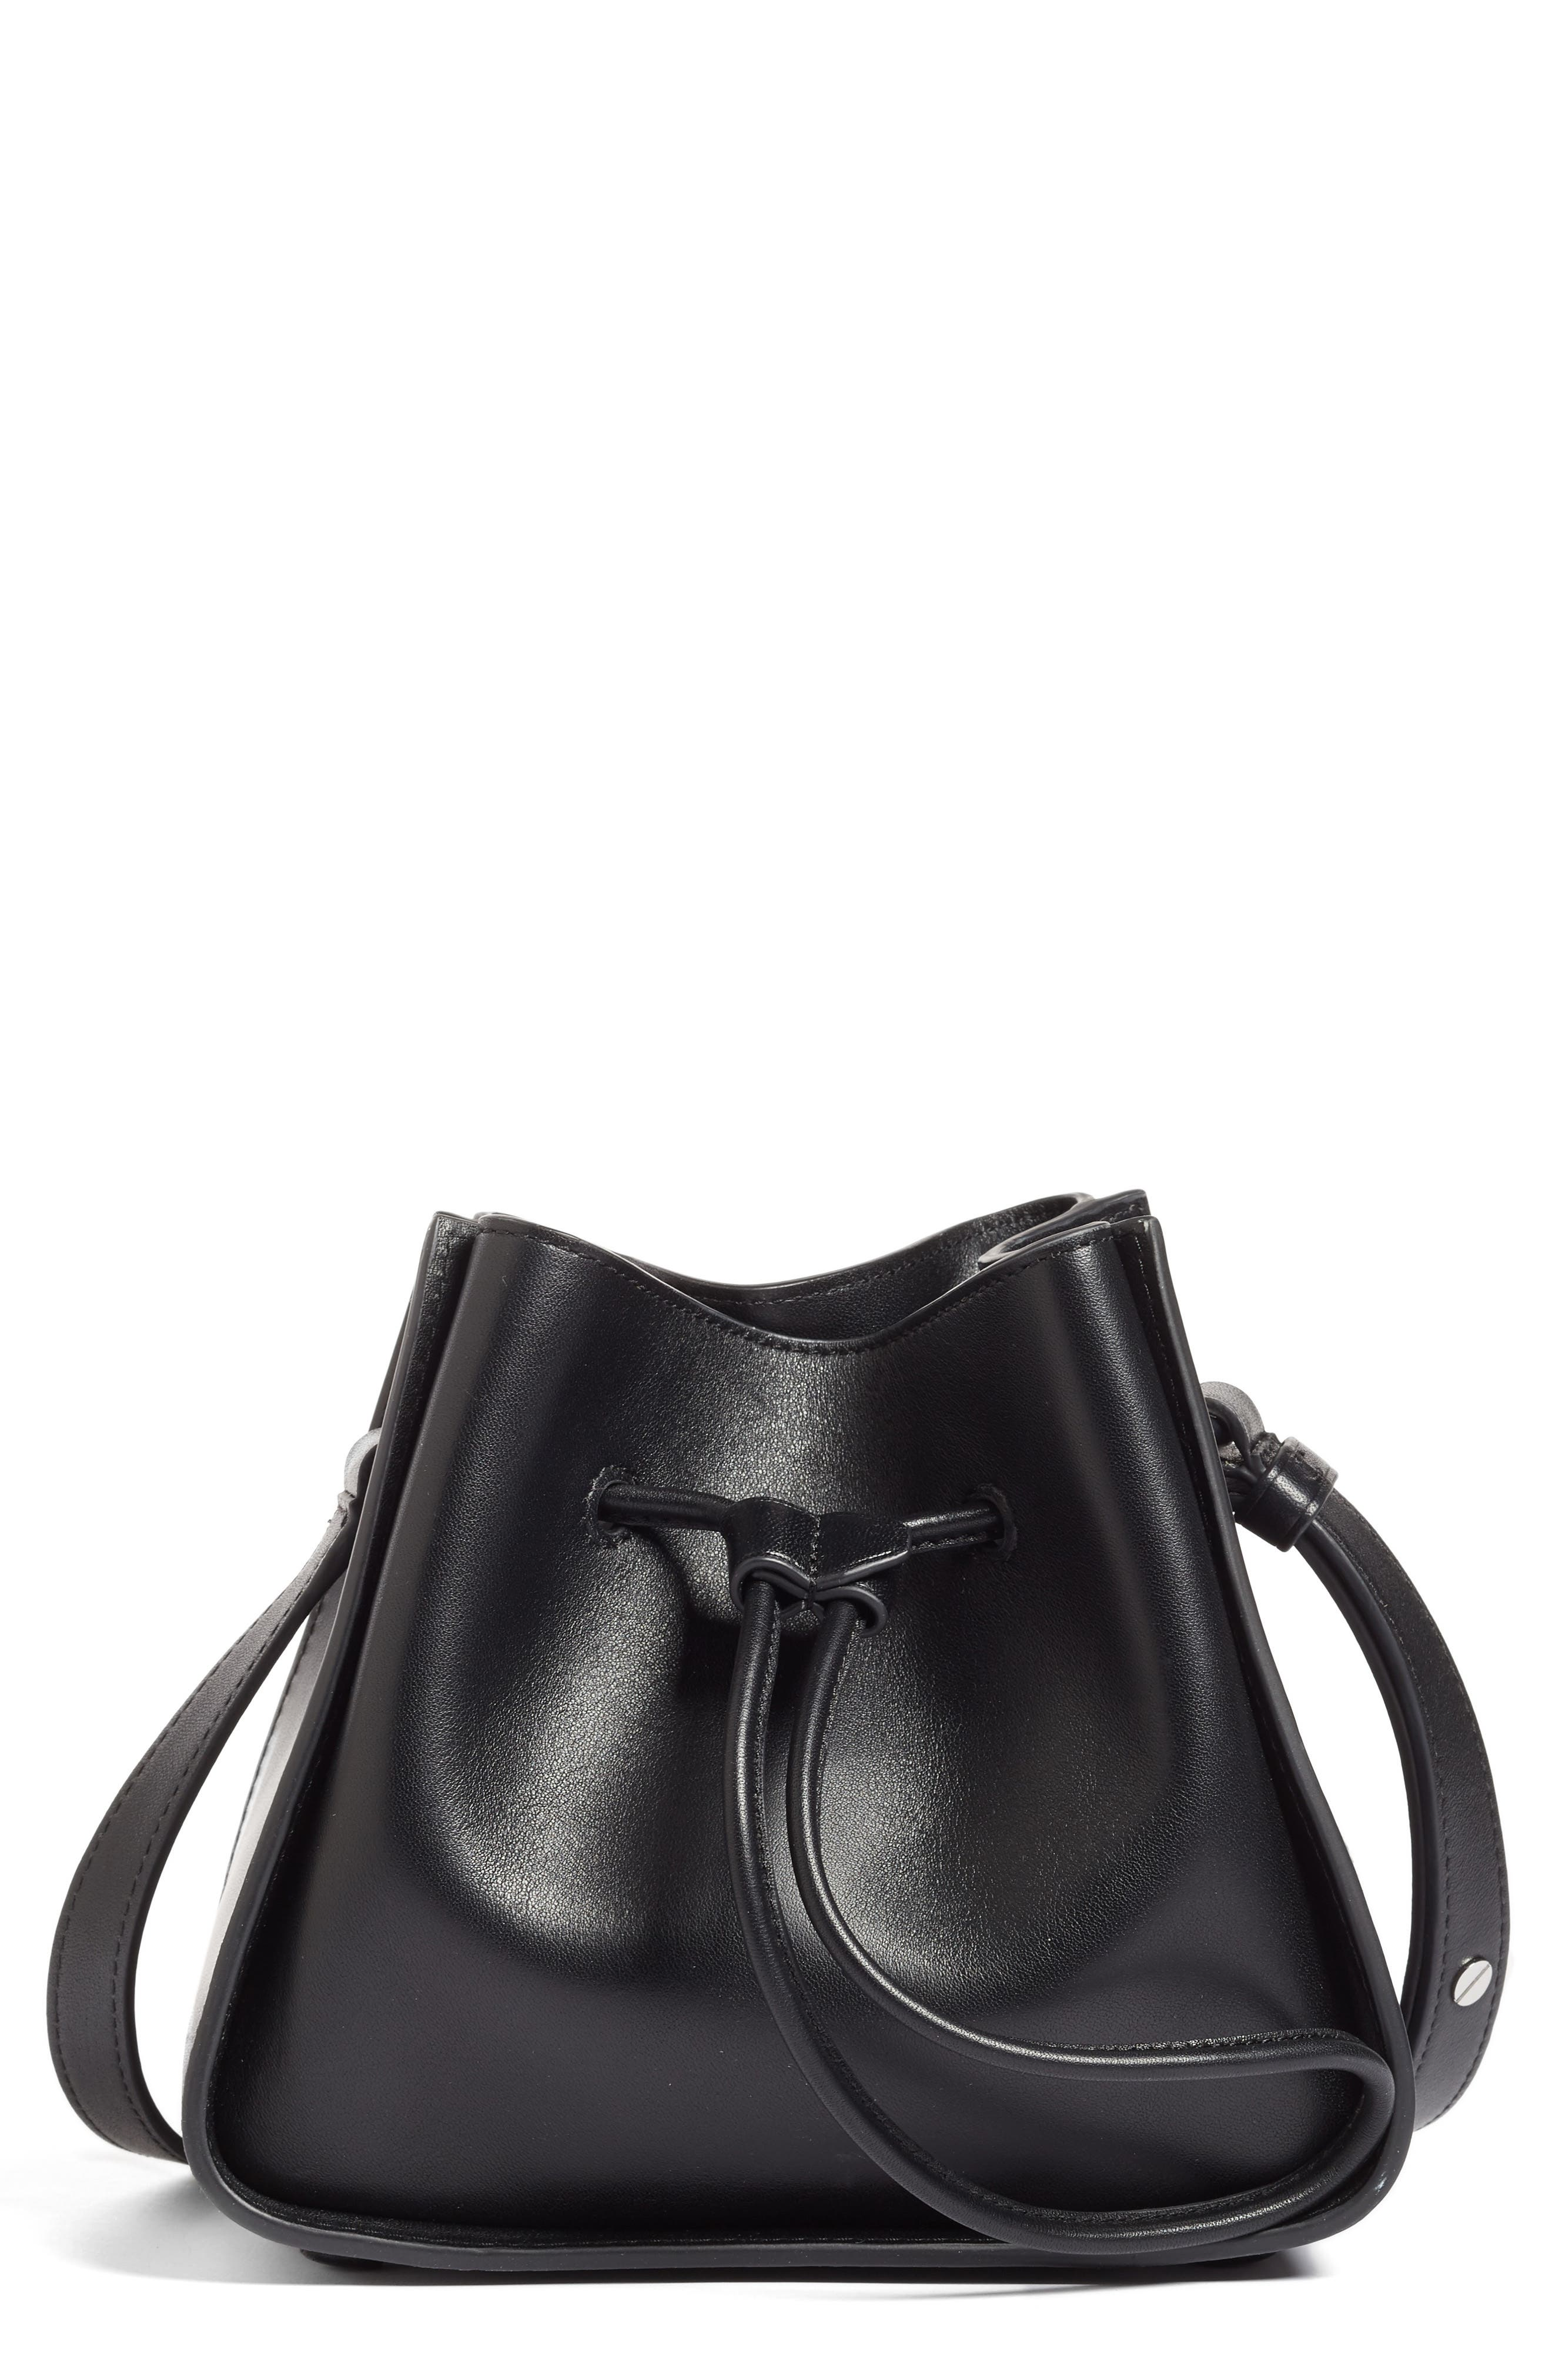 Mini Soleil Leather Bucket Bag,                             Main thumbnail 1, color,                             001